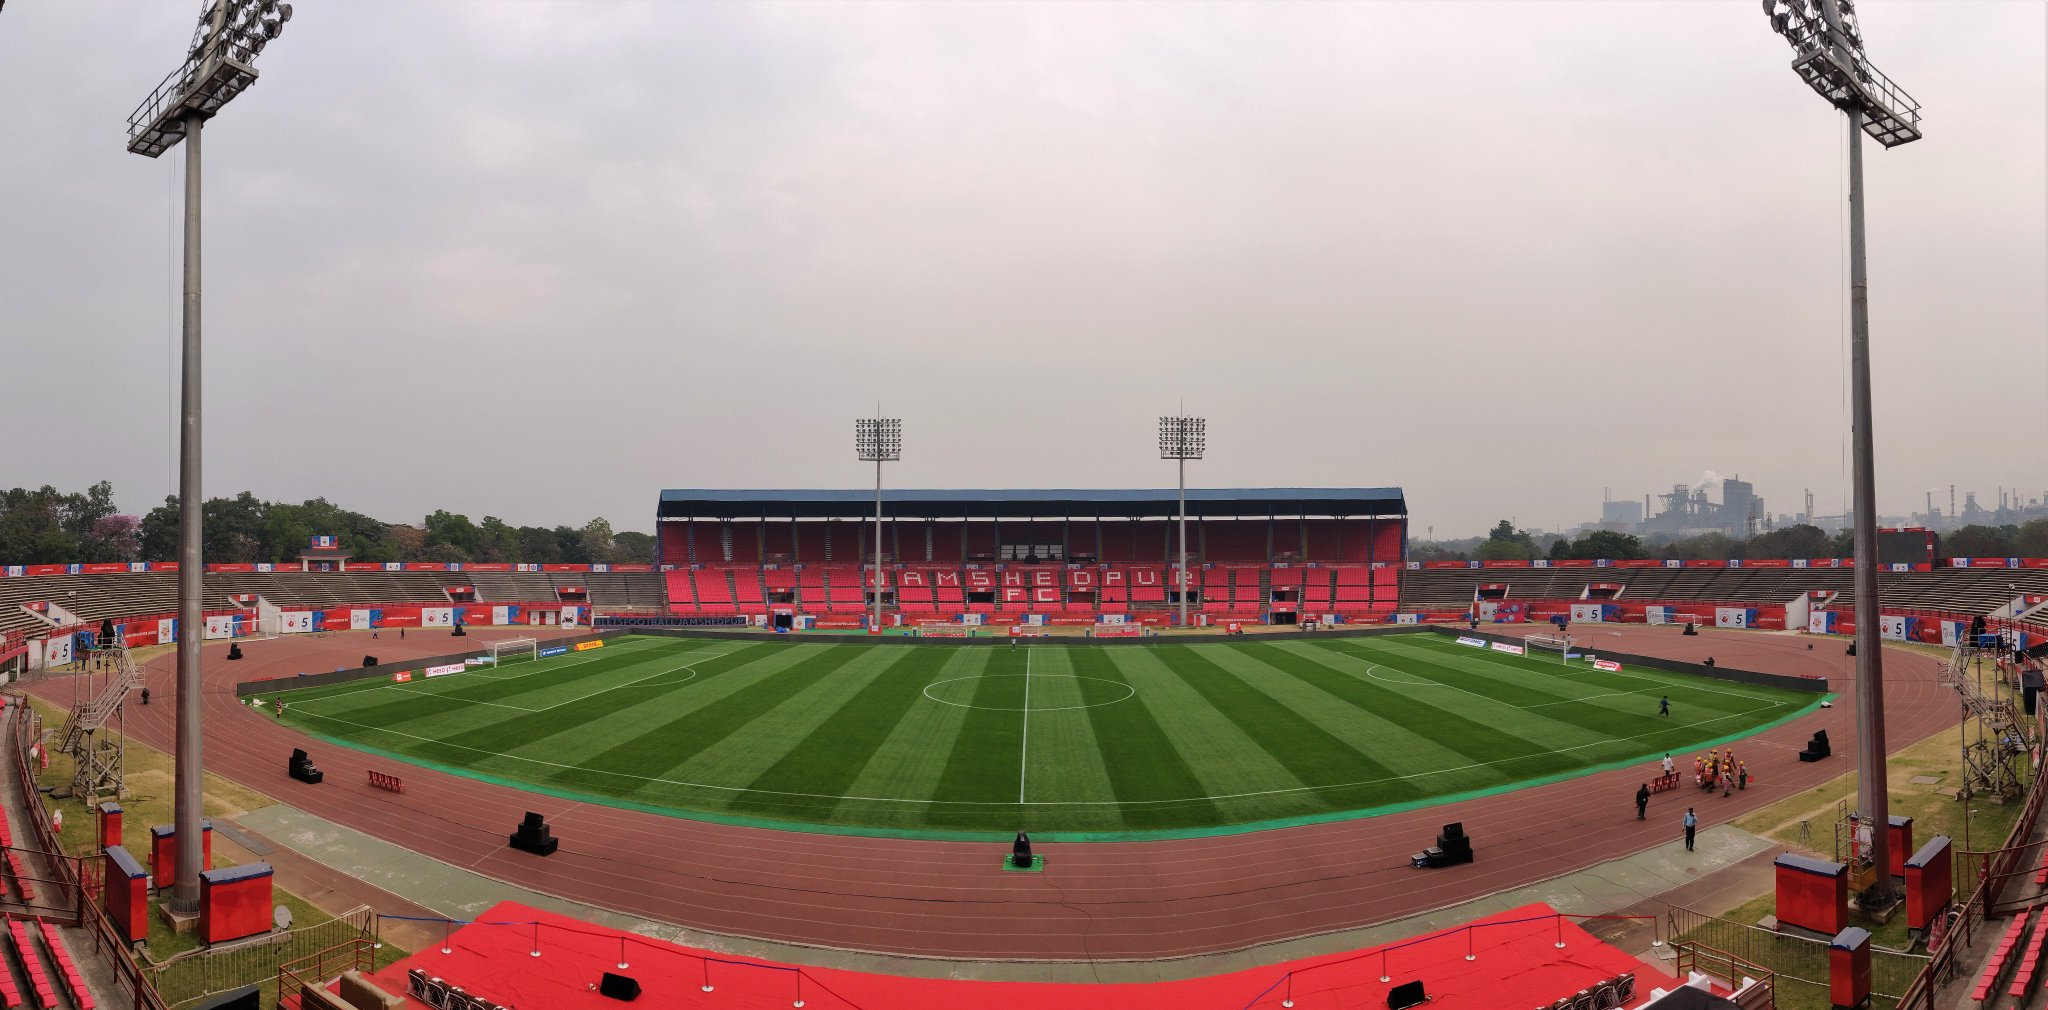 J.R.D. Tata Stadium